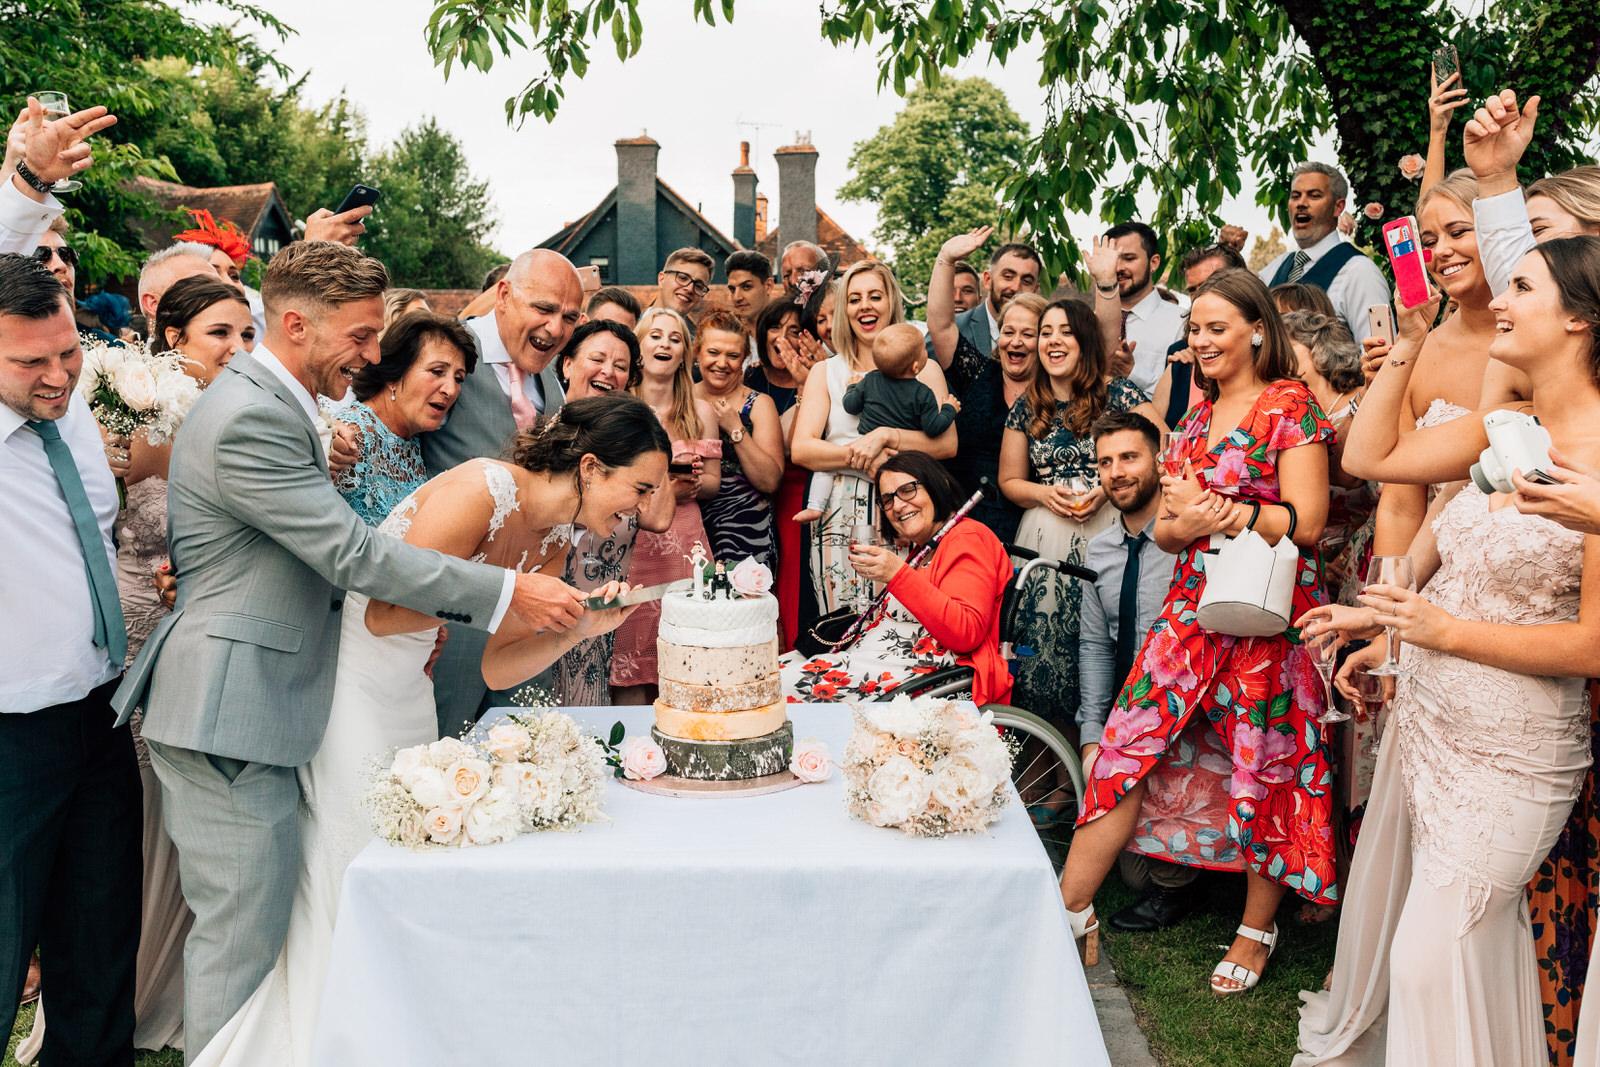 Home counties wedding photography by Damion Mower on English-Wedding.com (7)